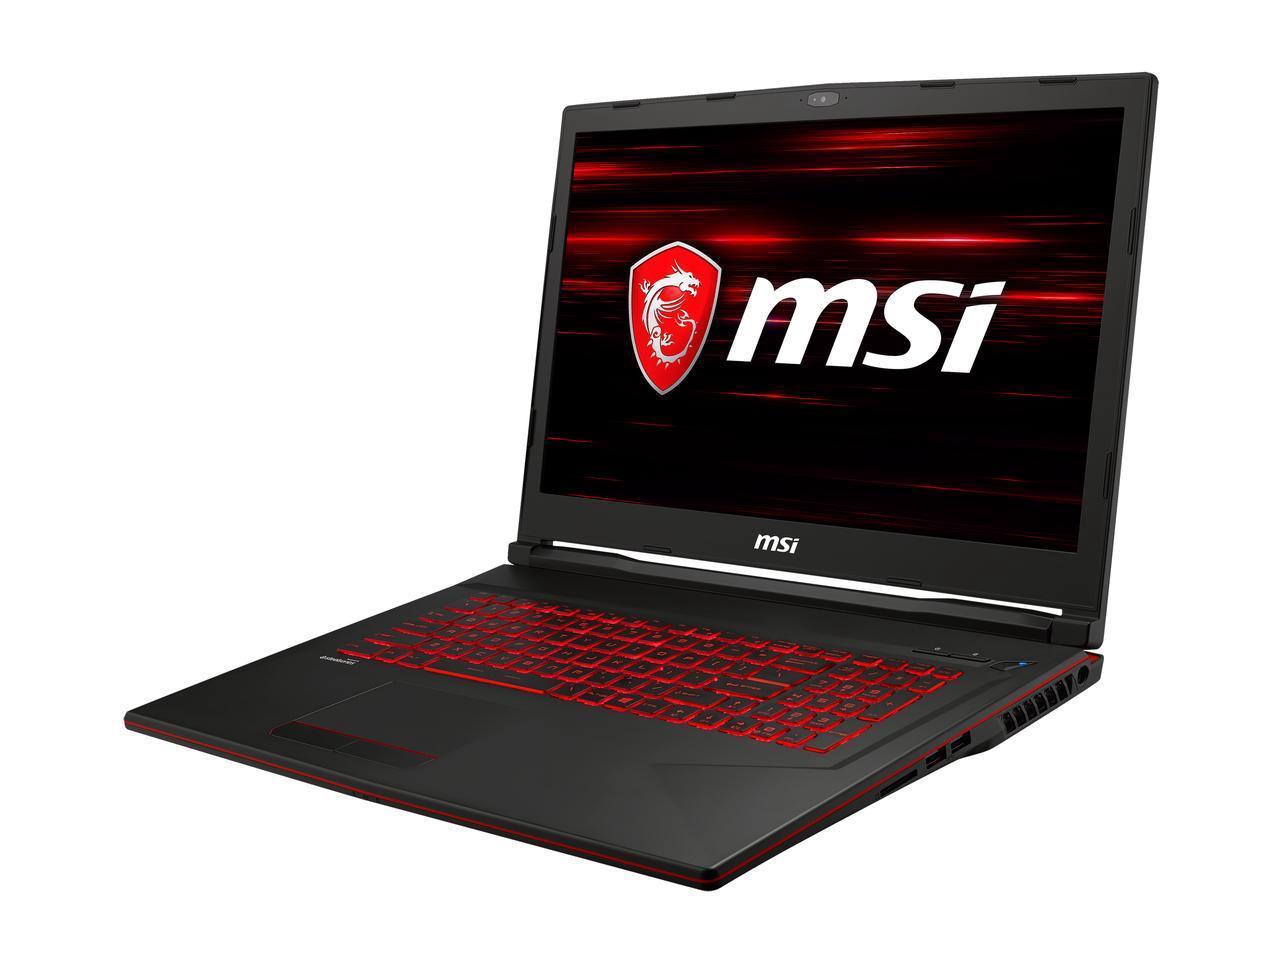 MSI GL73 8SE-010 Gaming Laptop: 17.3'' FHD 120 Hz, i7-8750H, 16GB DDR4, 128GB PCIe SSD, 1TB HDD, RTX 2060, WIn10H @ $1199 AR + F/S